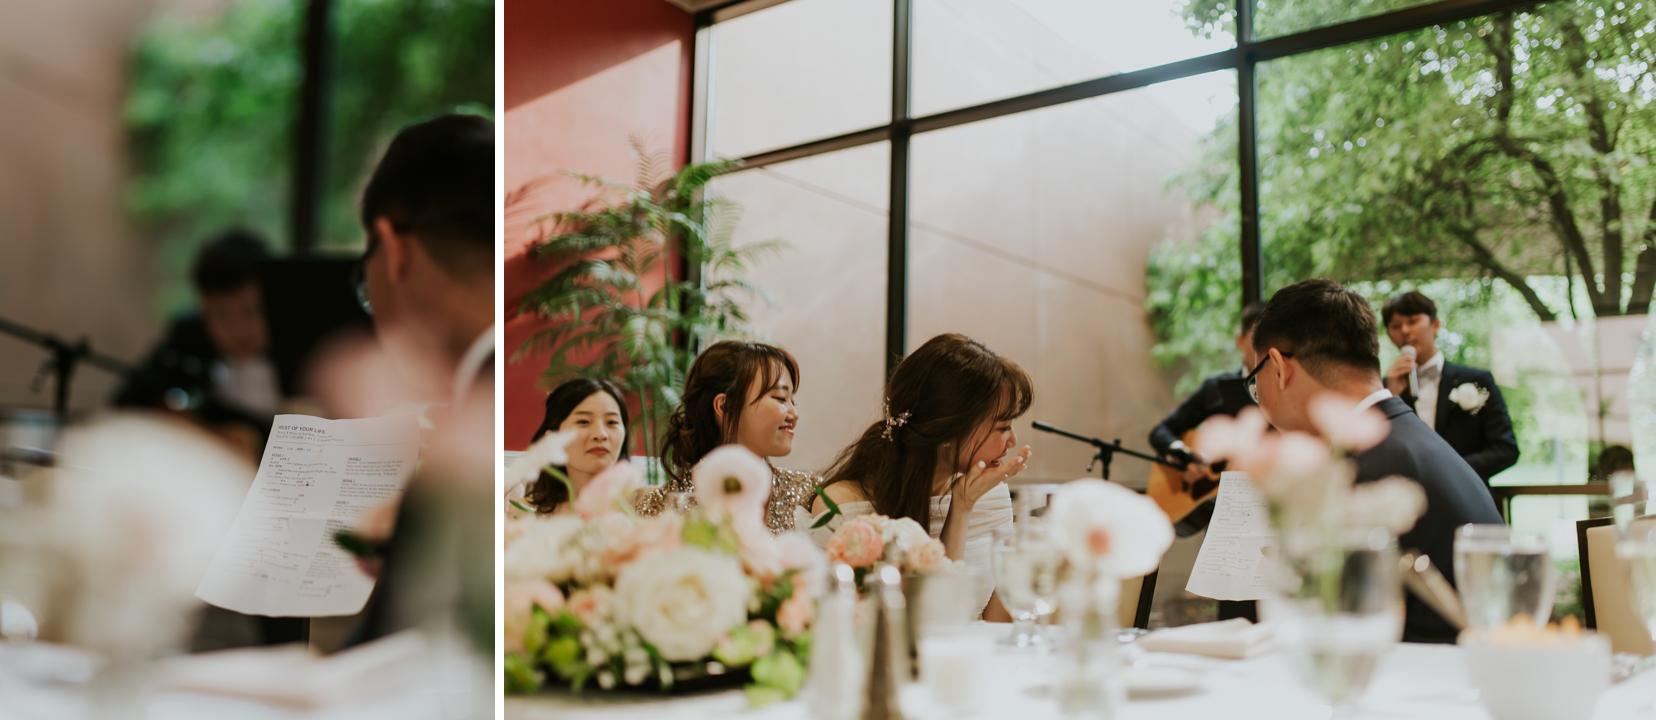 LGP-ann-arbor-eagle-crest-wedding-064.jpg